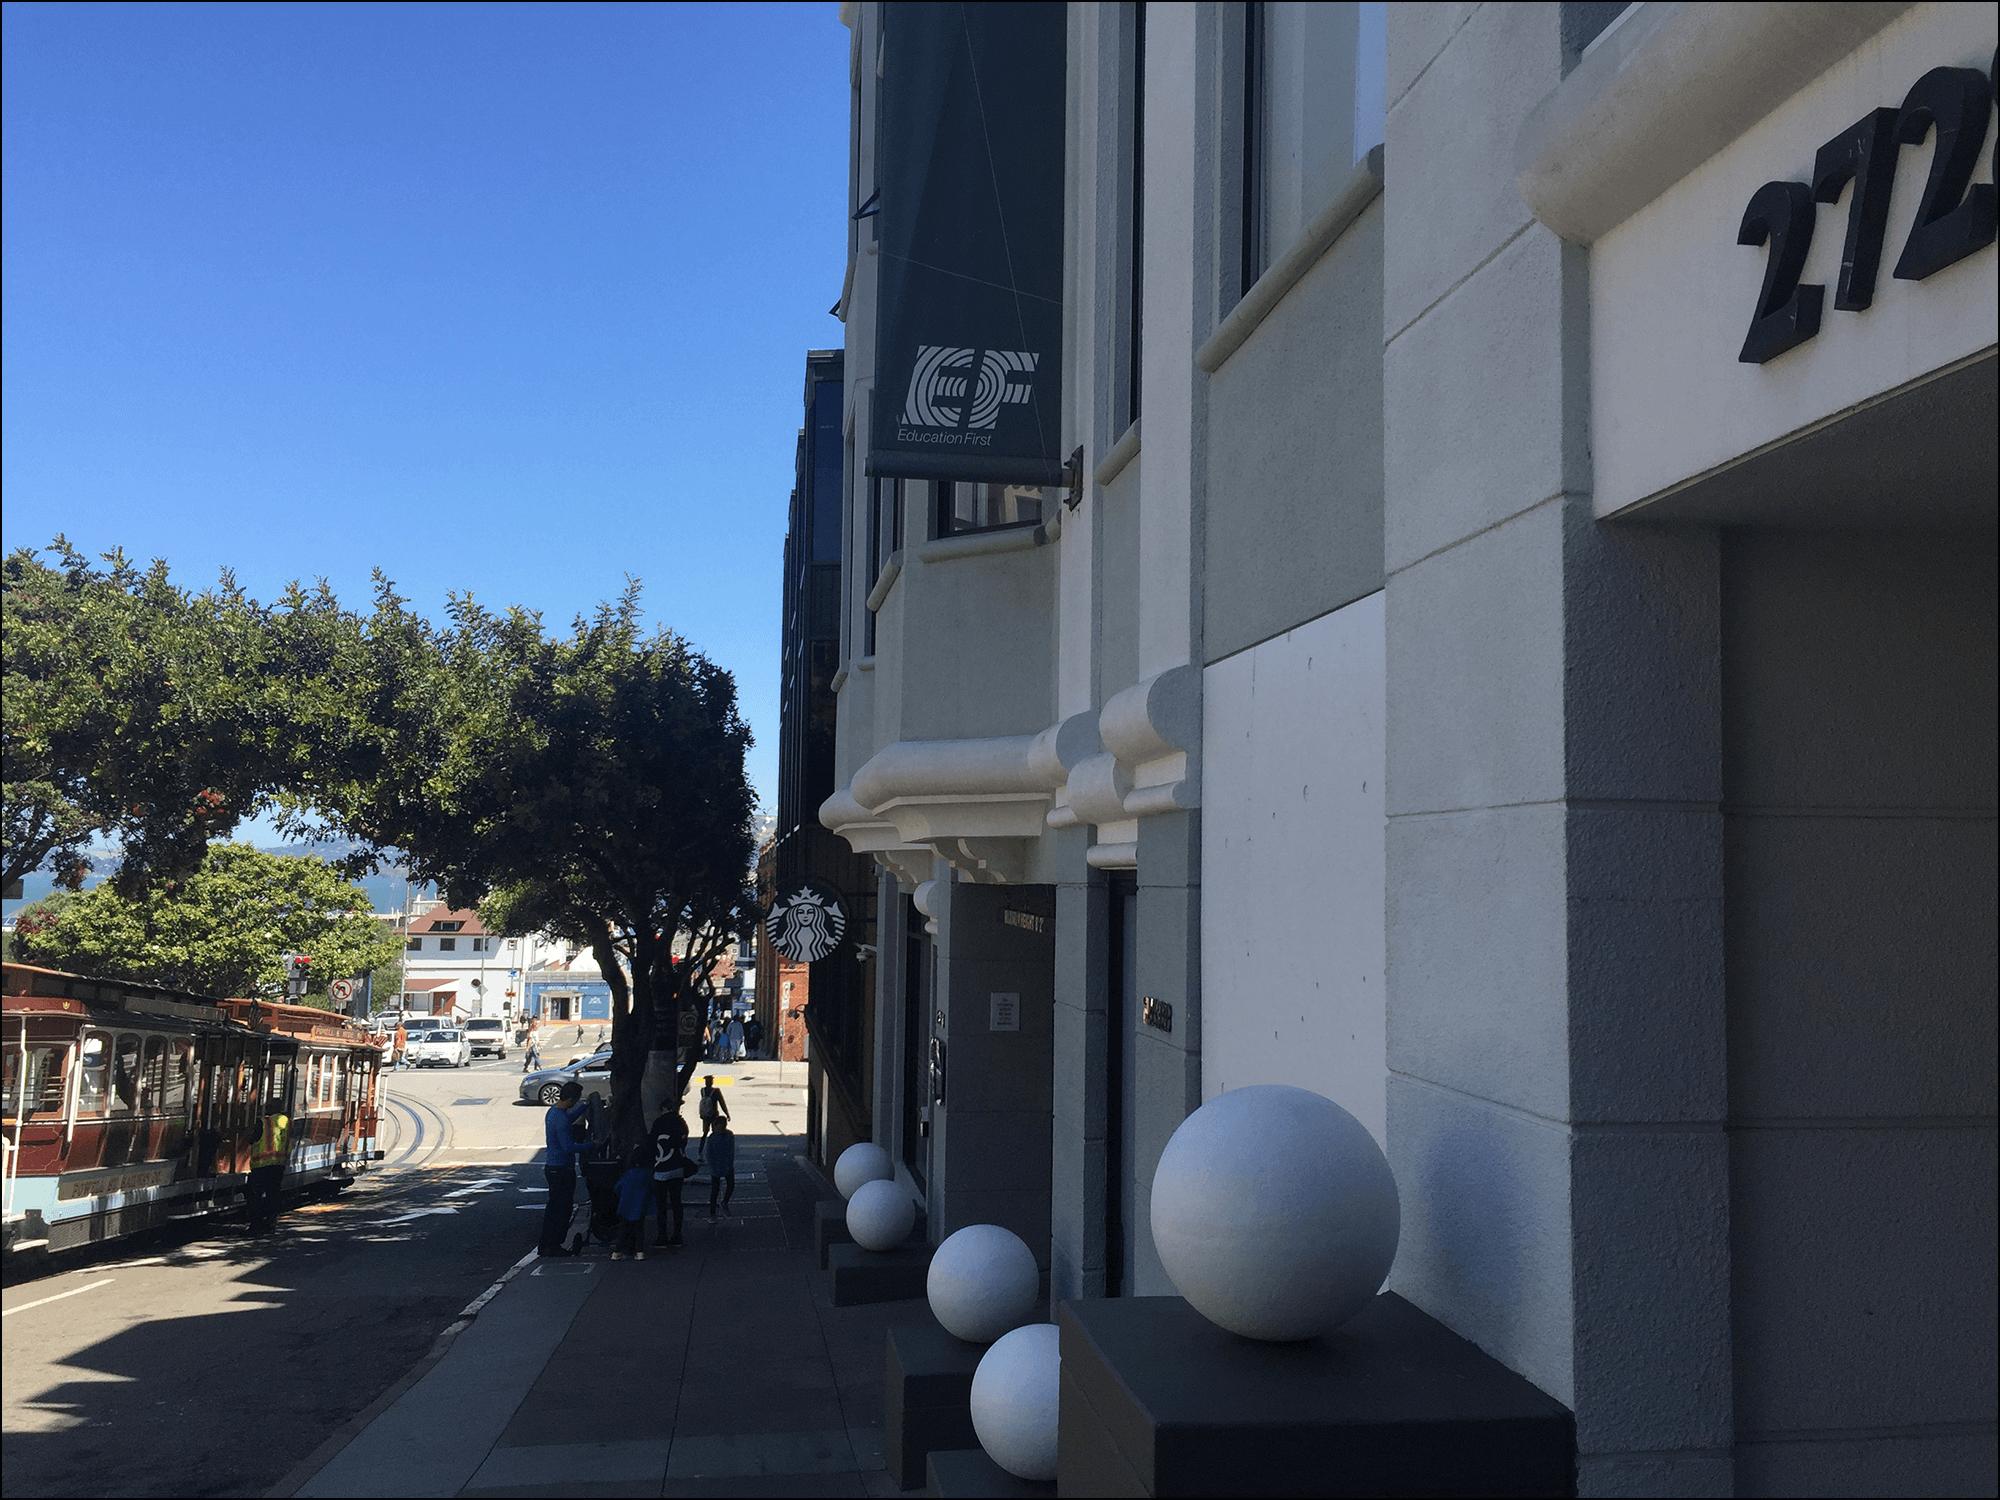 Education First EF San Francisco am Fishermans Wharf